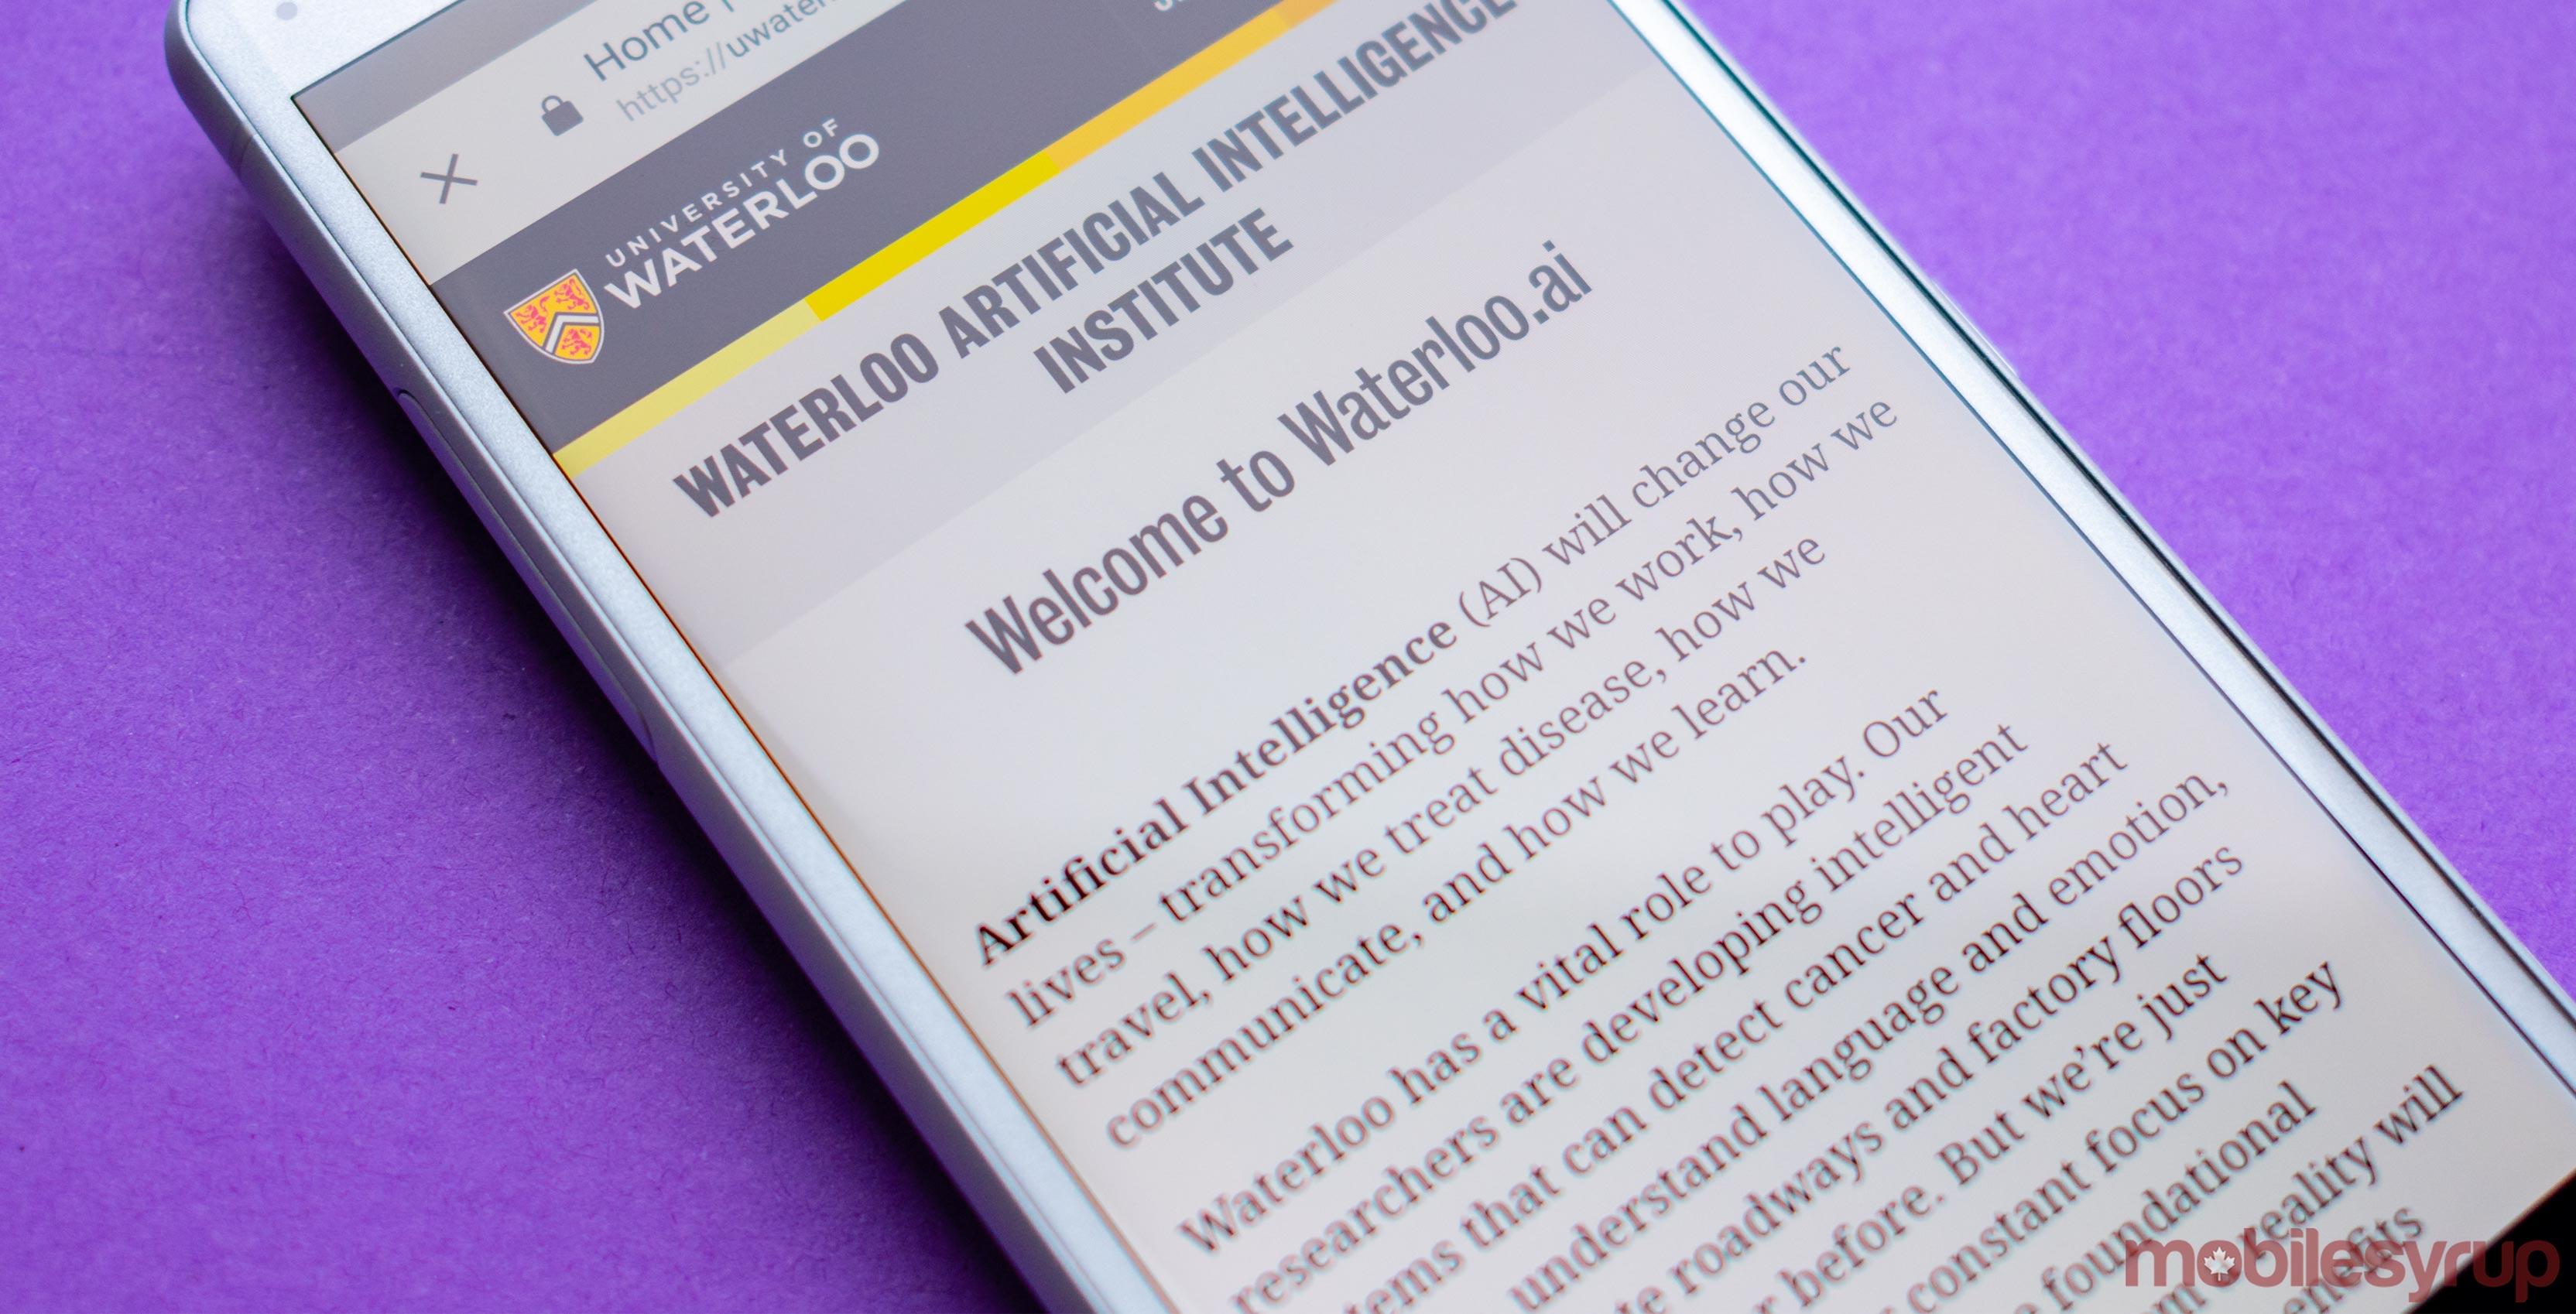 Waterloo AI Institute